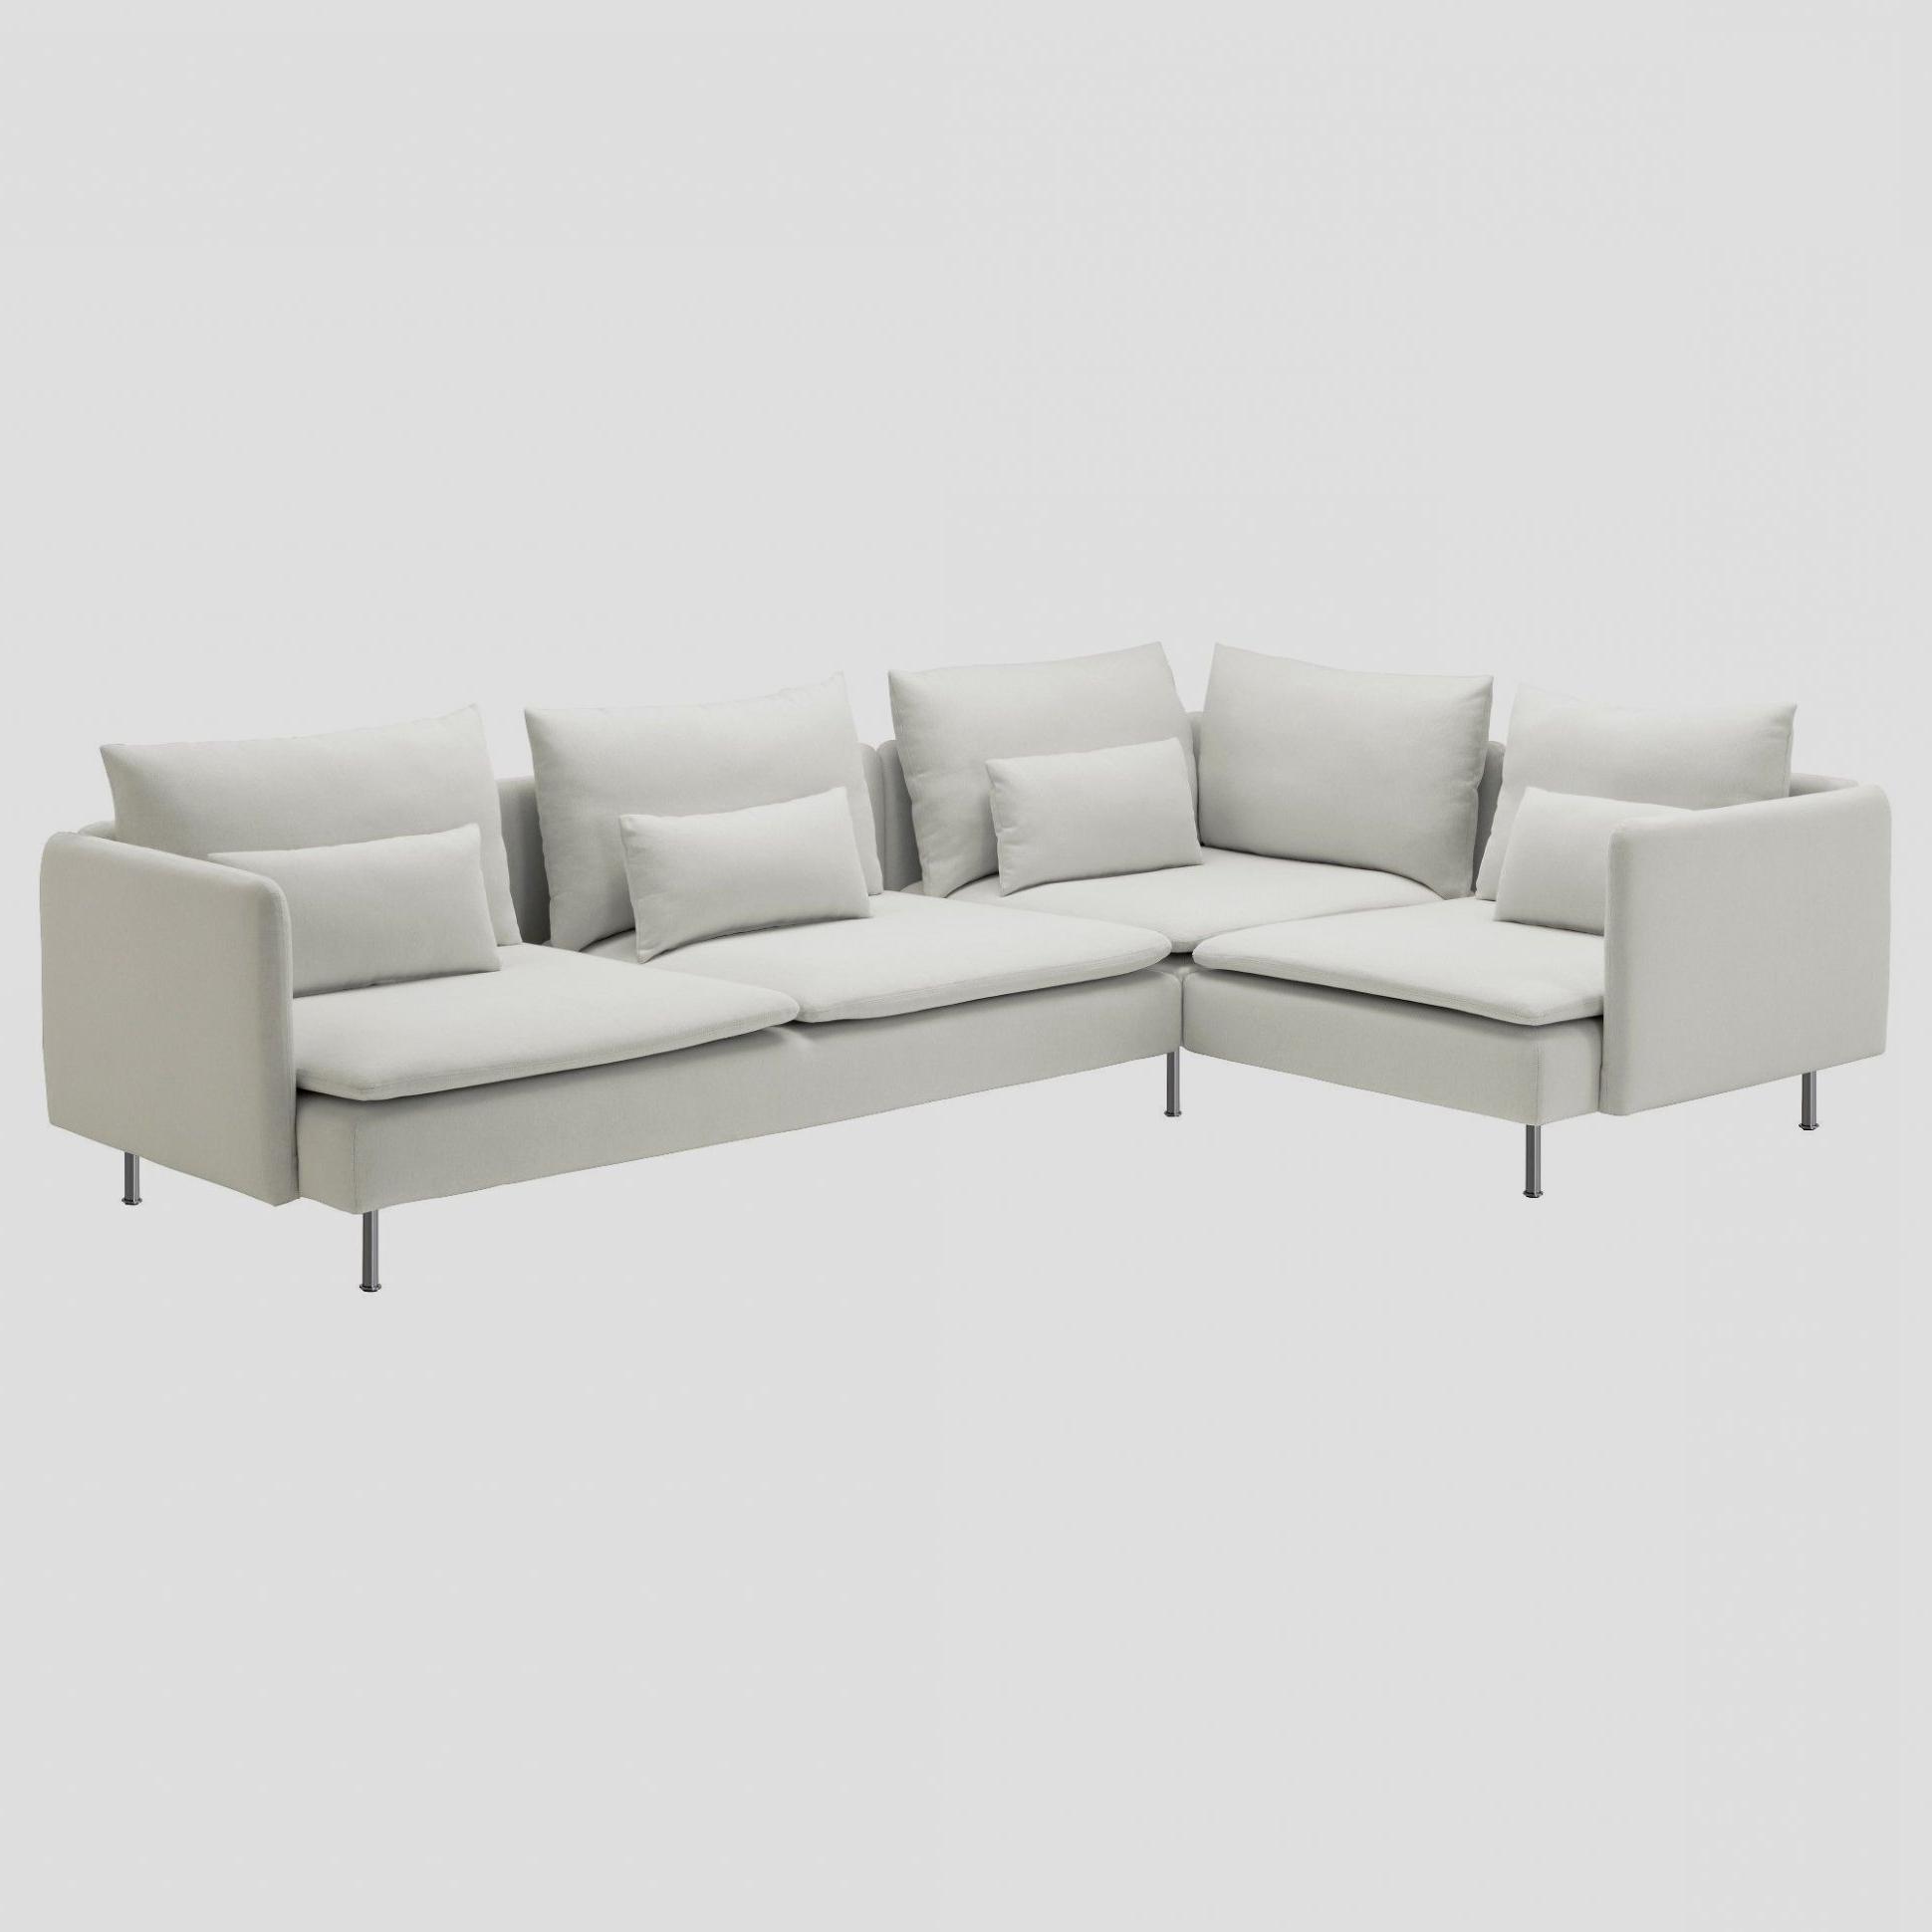 Sofas Modulares Ikea Y7du sofas Rinconeras Modulares Bello Ikea U sofa Busco Sillas